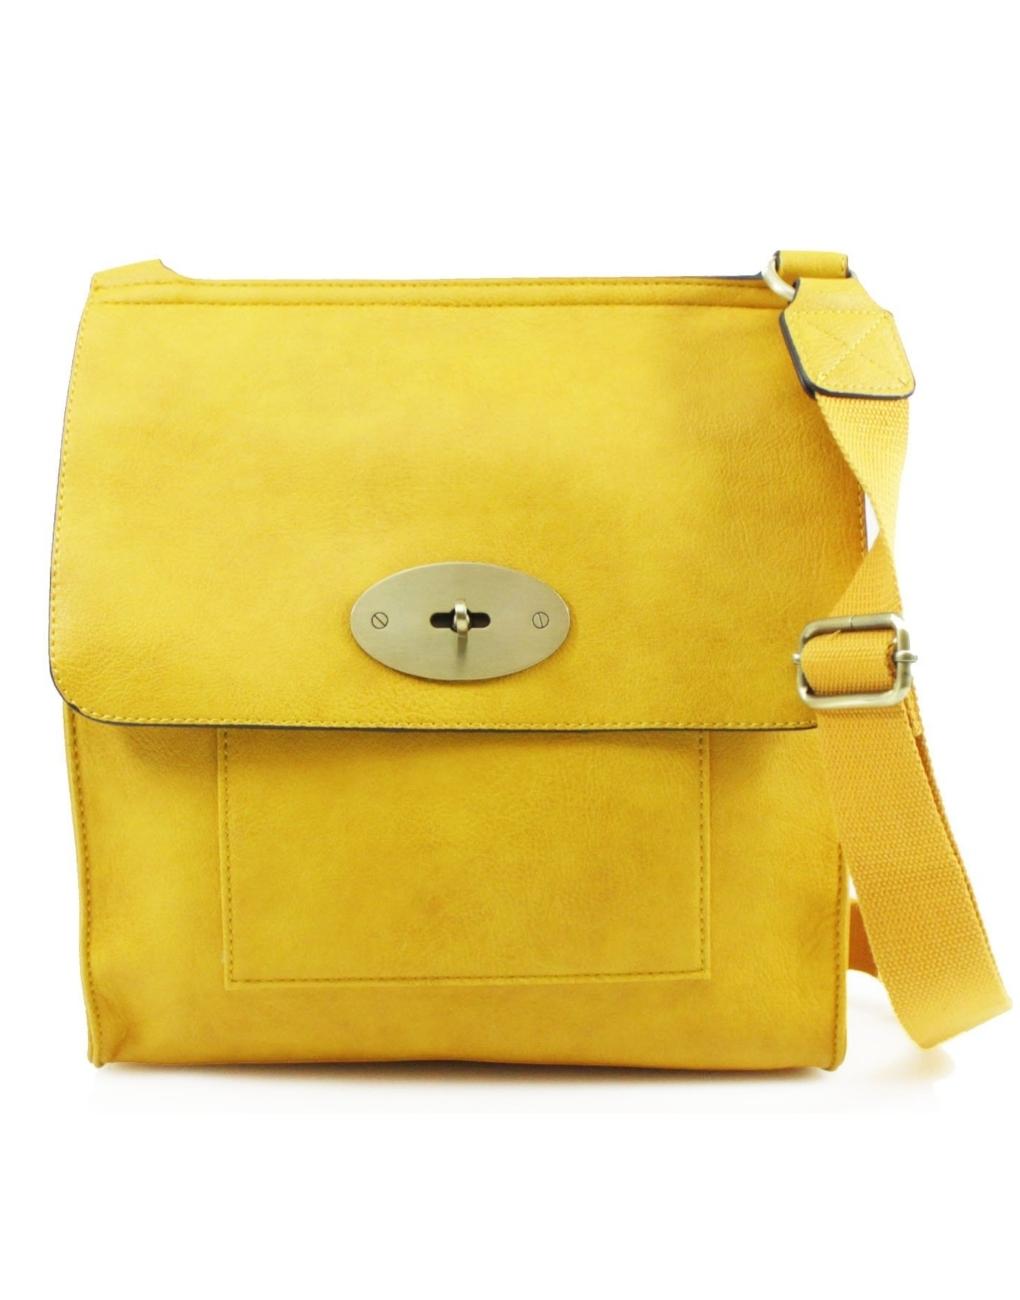 Large Yellow Satchel Bag